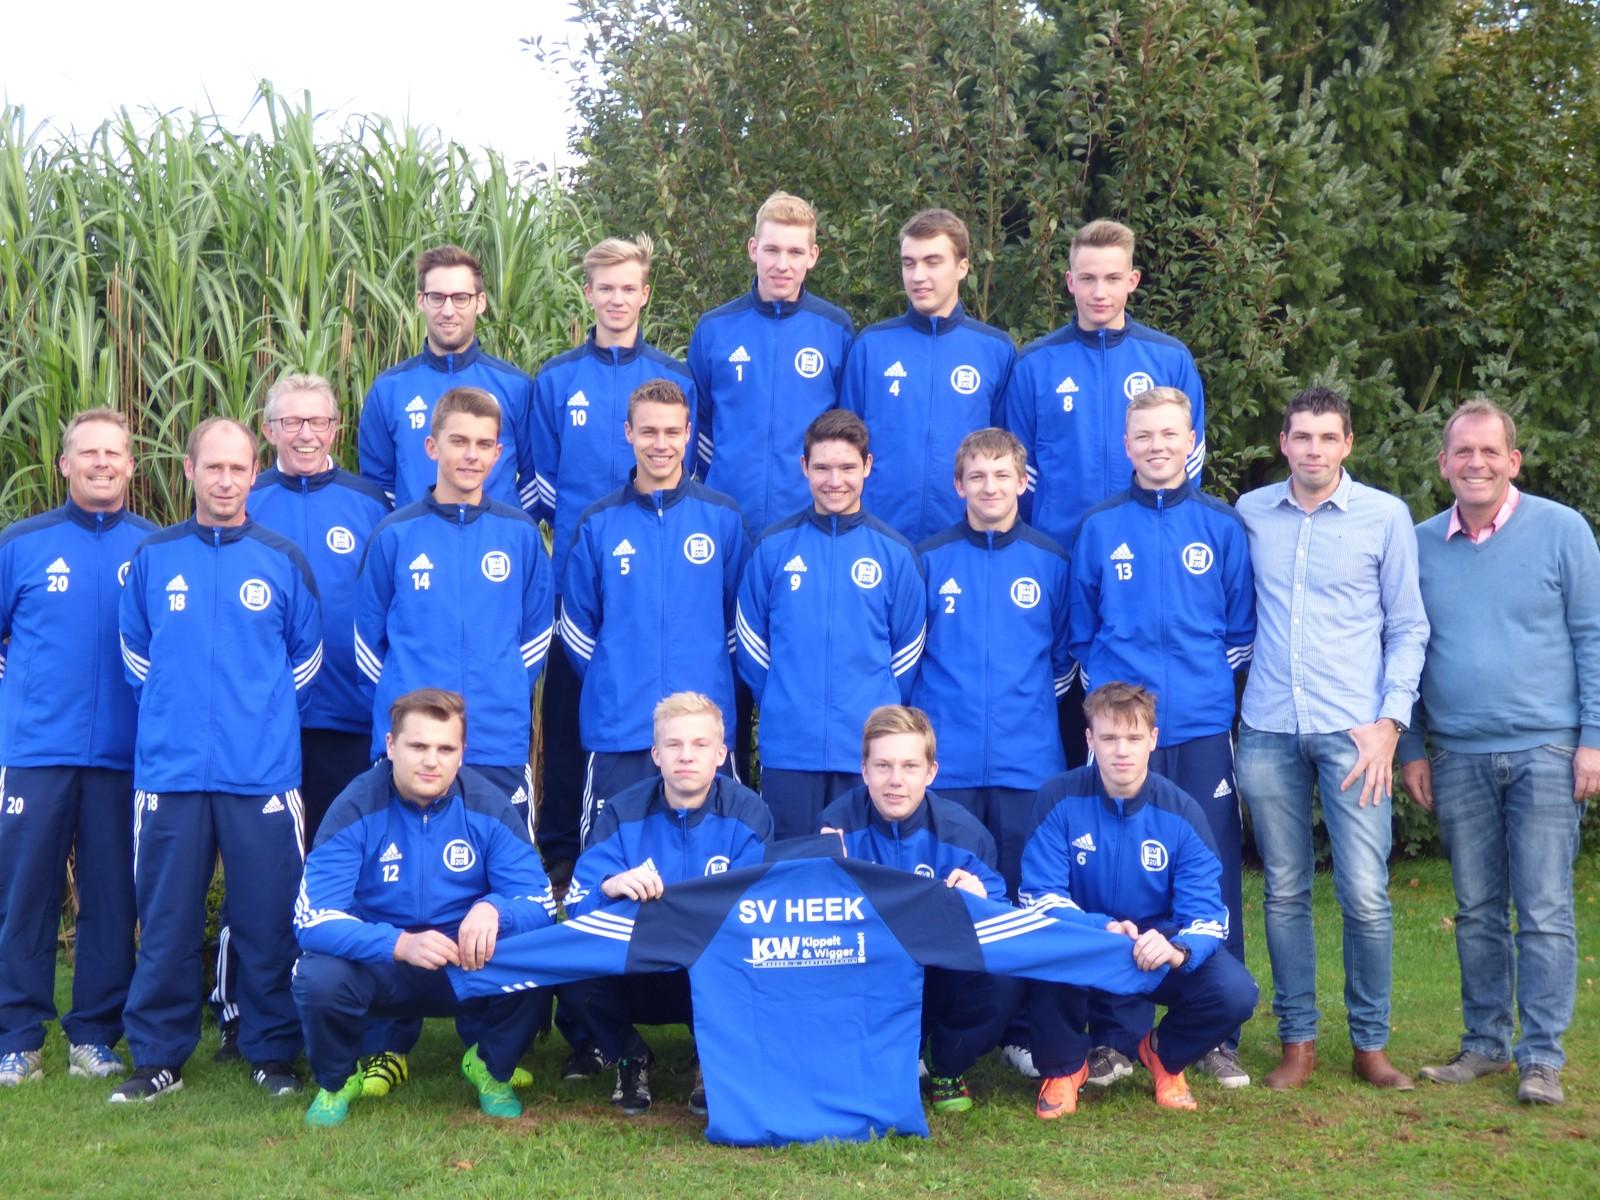 Kippelt und Wigger ist Sponsor der A-Jugend des SV Heek